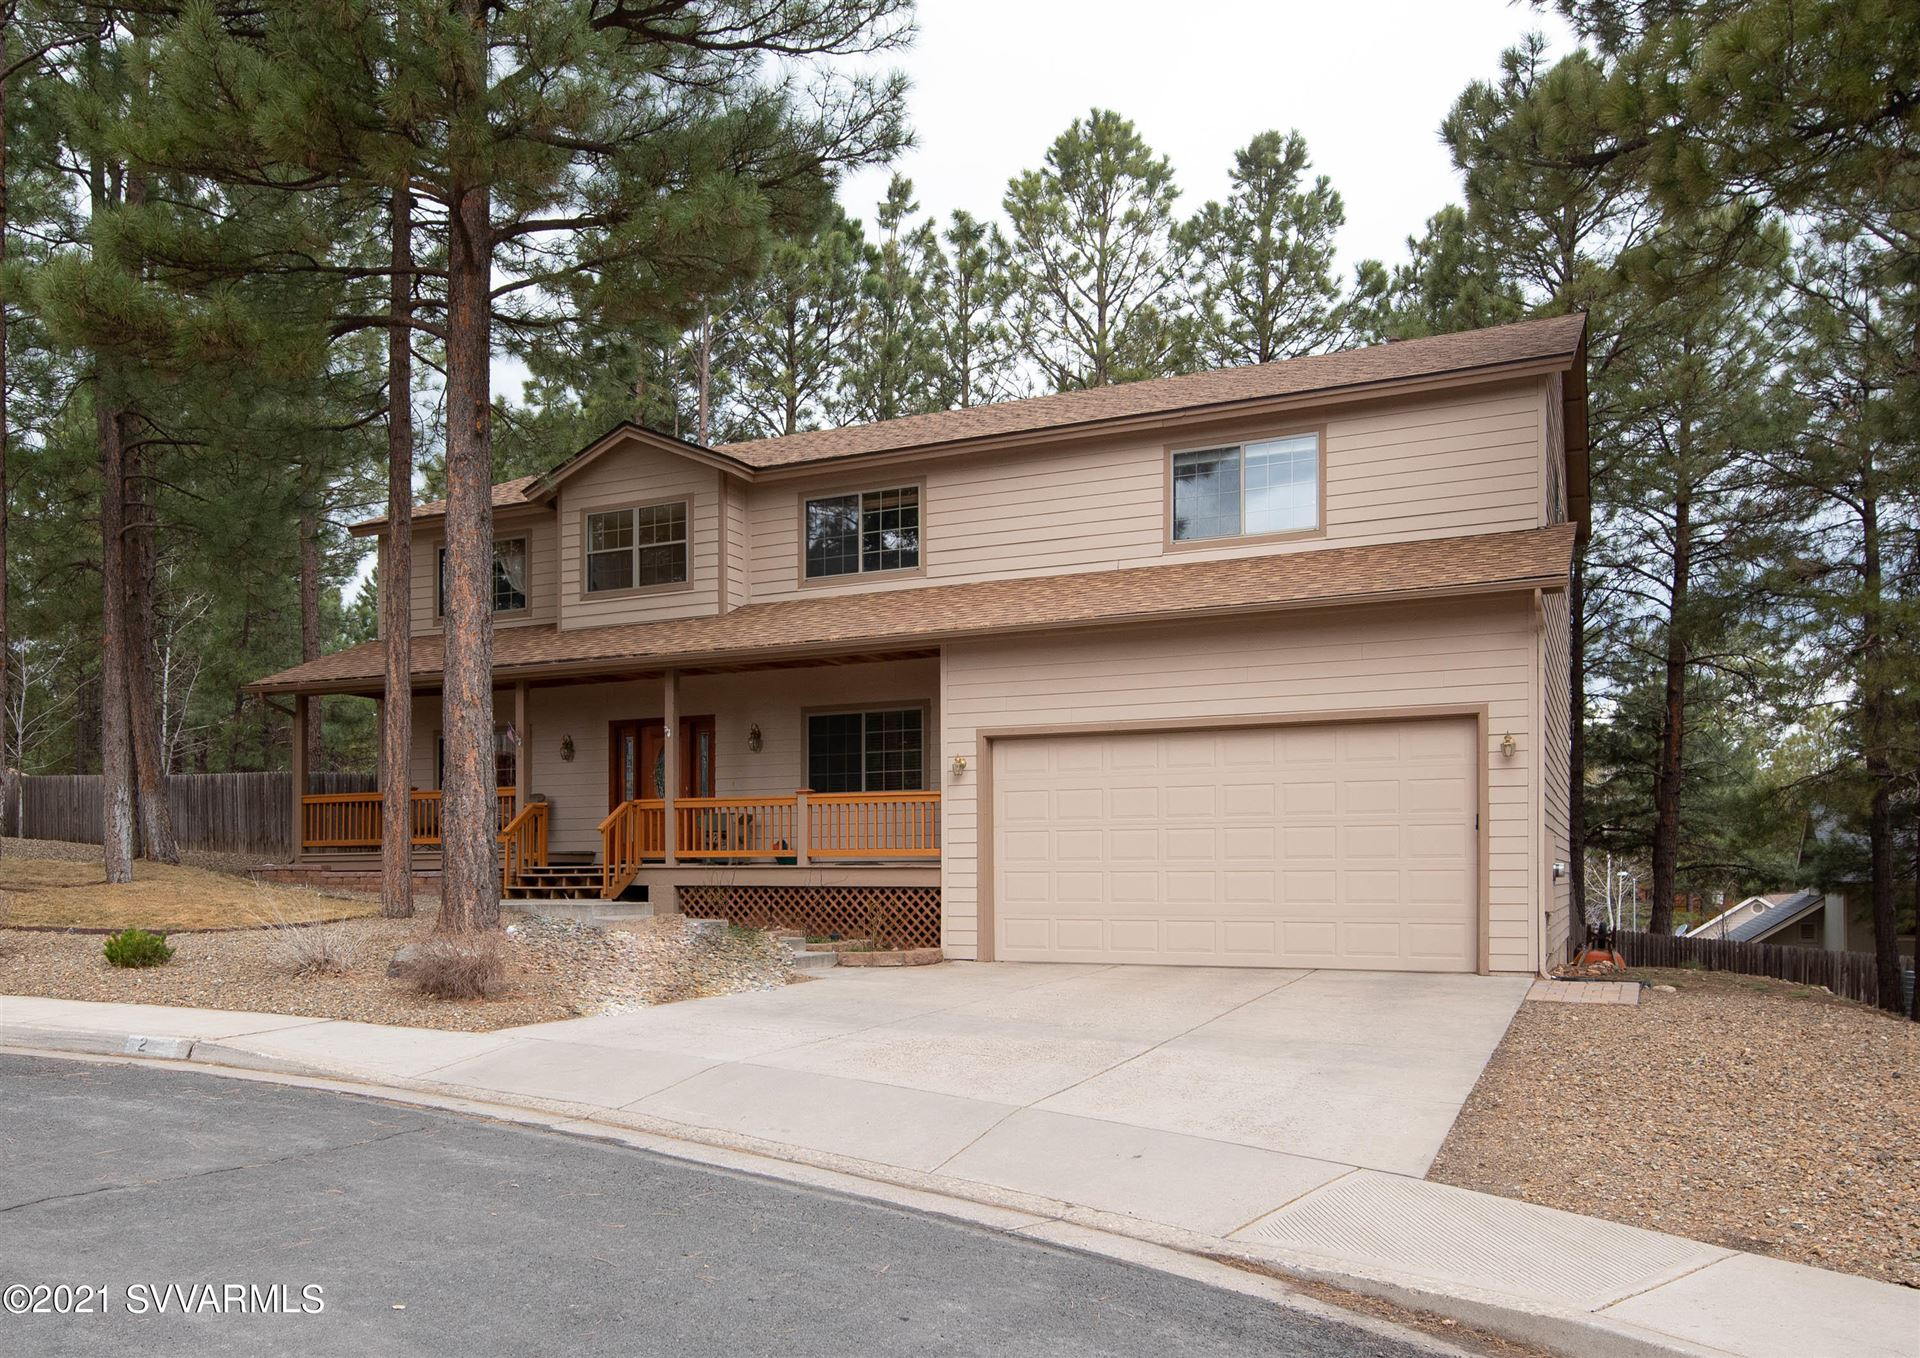 Photo of 2 E Mohawk Drive, Flagstaff, AZ 86005 (MLS # 525748)